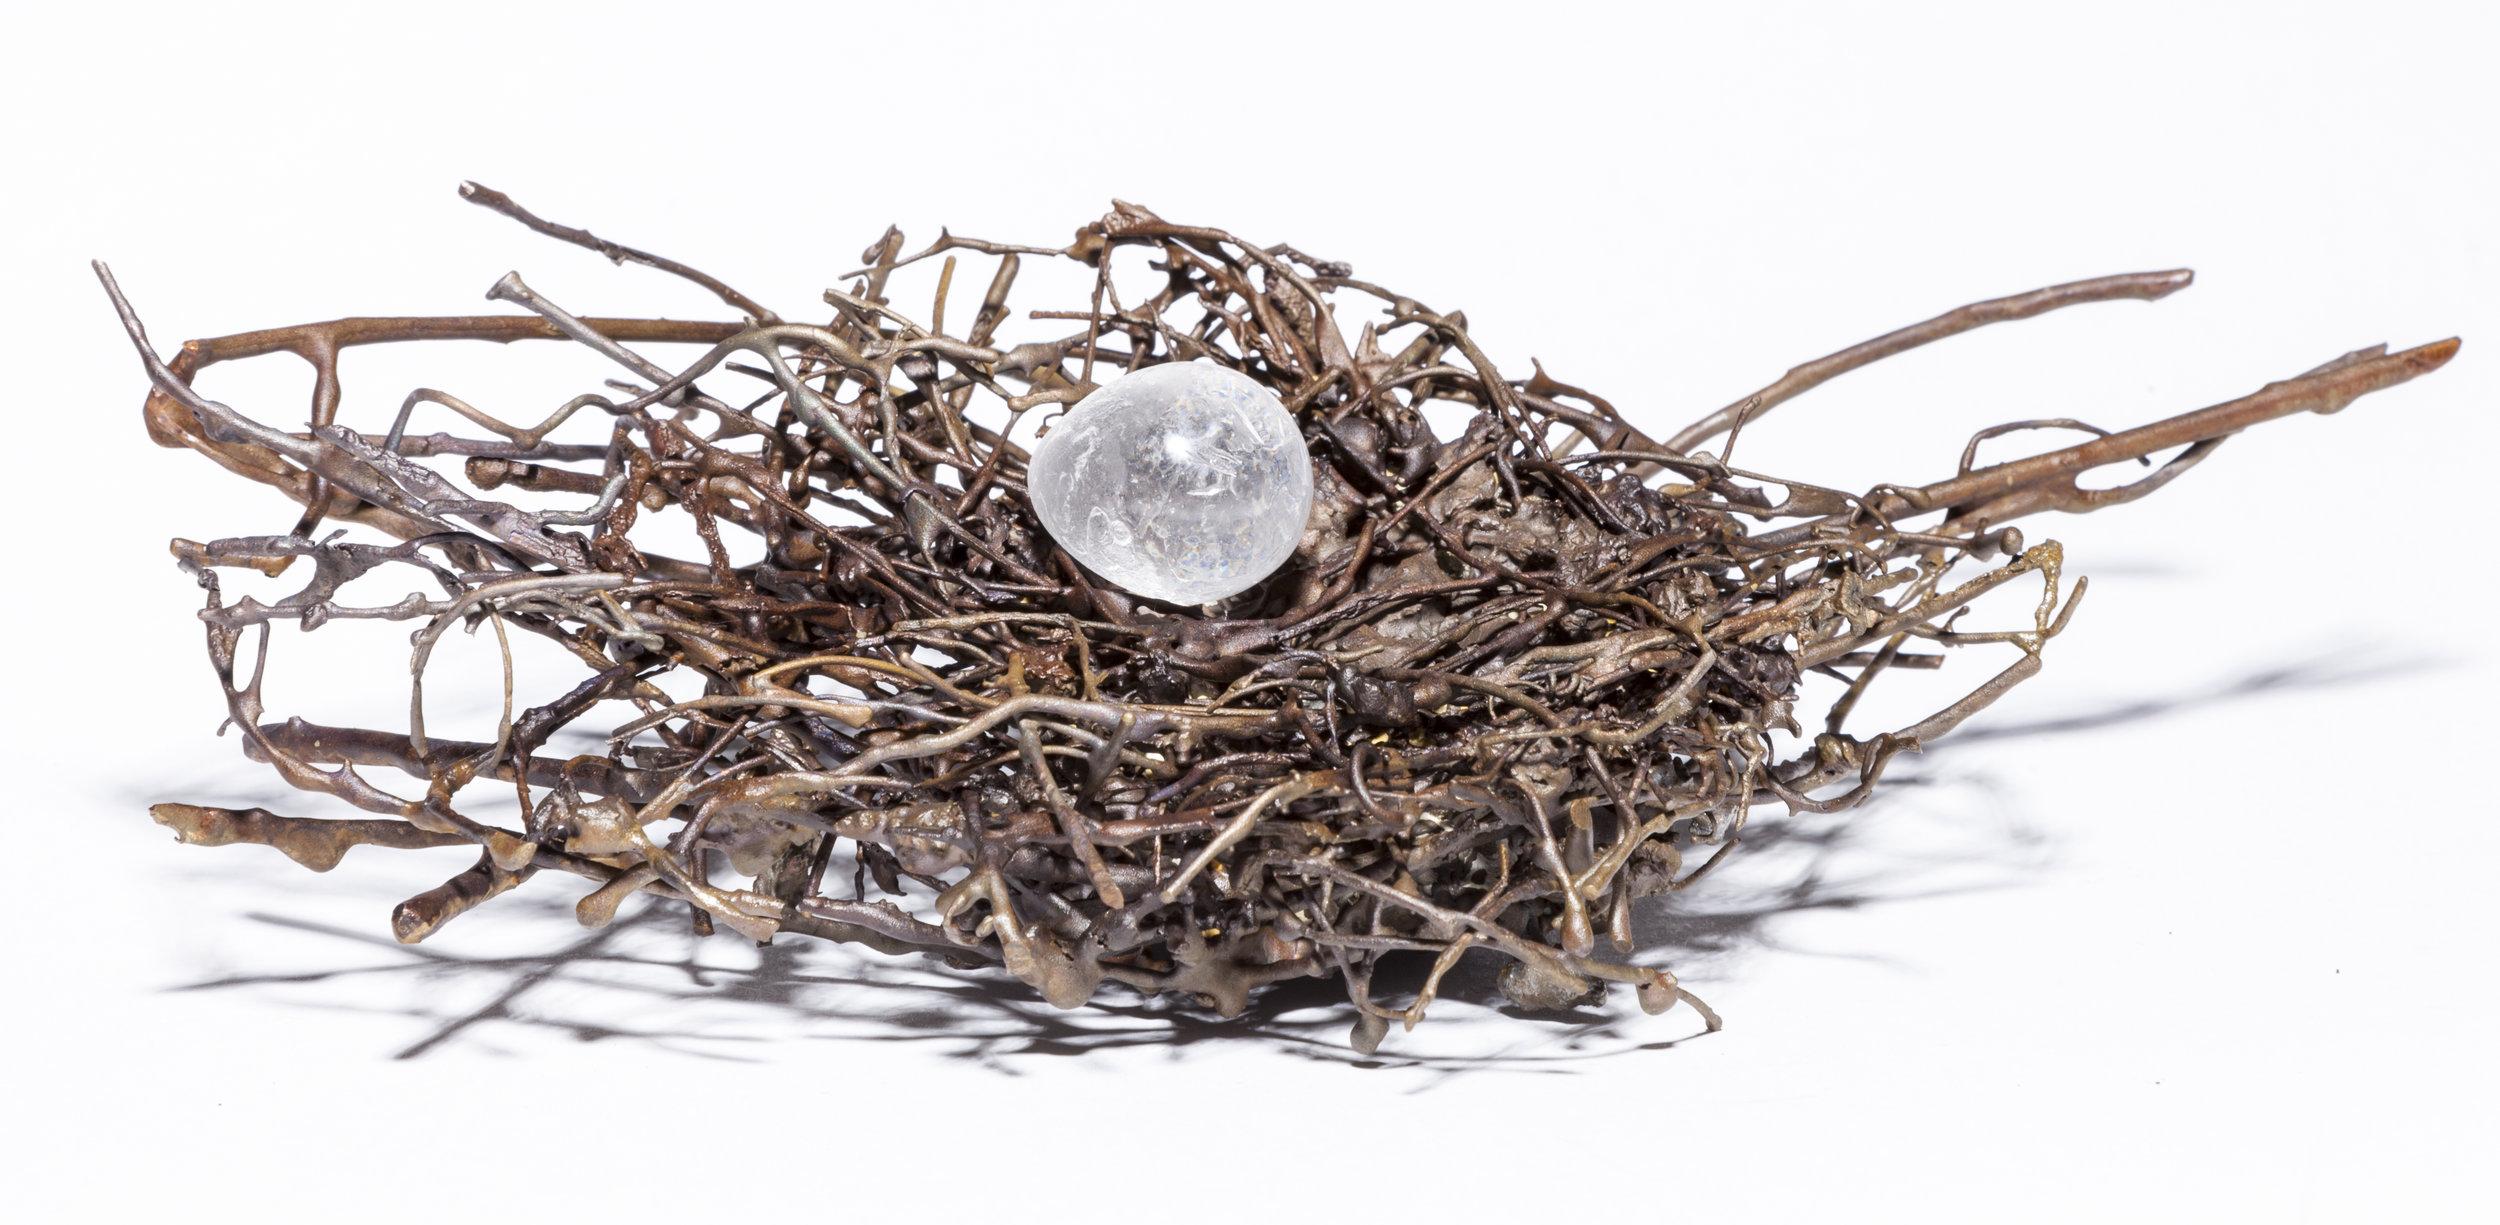 BaleCreekAllen Nests-031.jpg